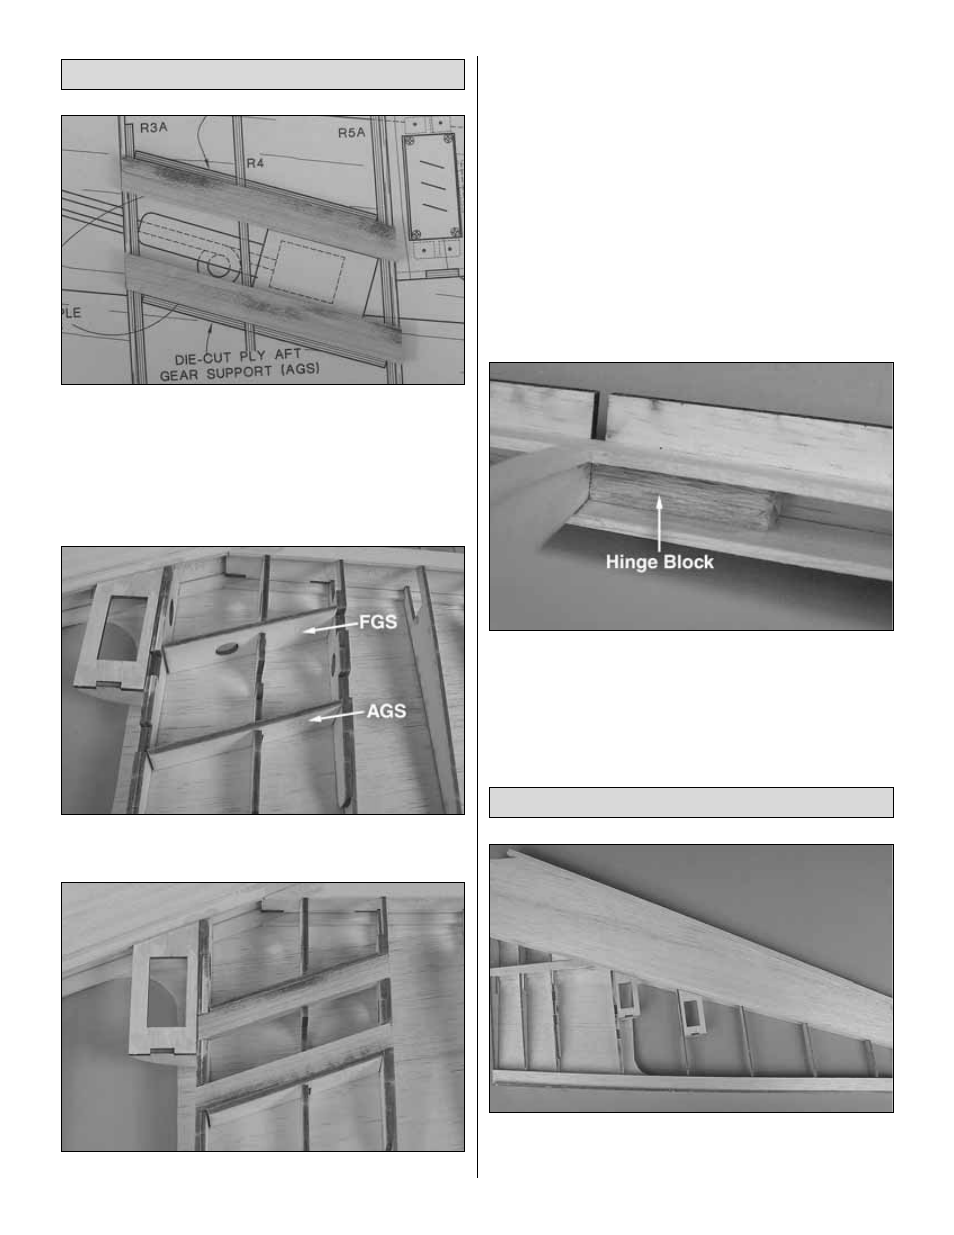 great planes patriot xl kit gpma0450 user manual page 16 48 rh manualsdir com iPod 5 Manual iPhone 5 Manual